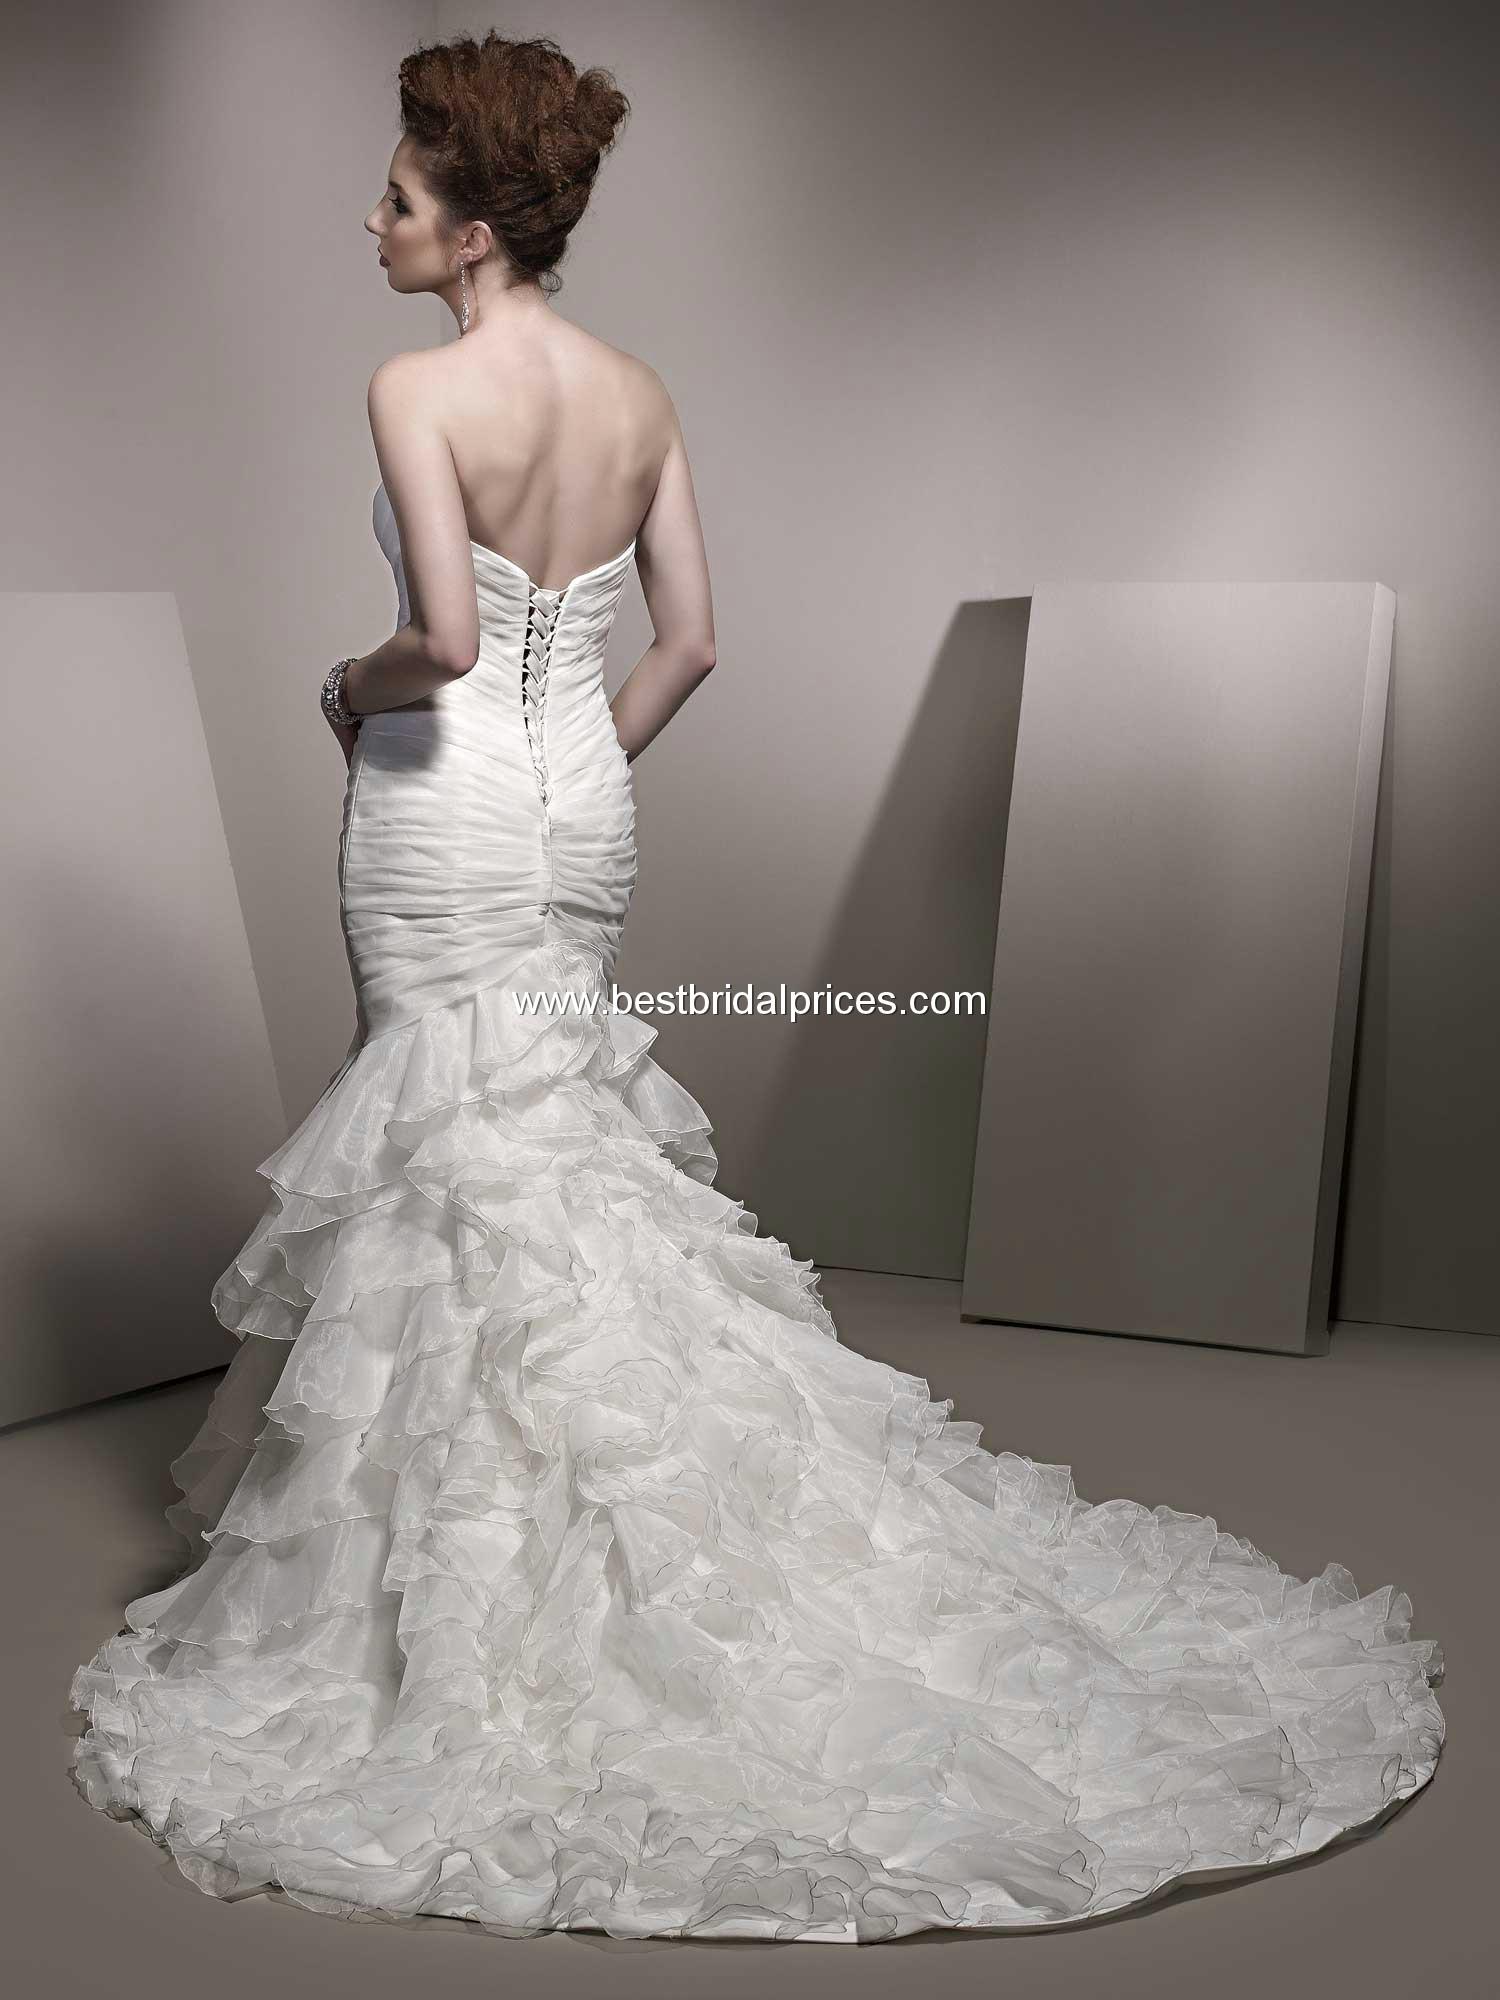 ella wedding dresses photo - 1